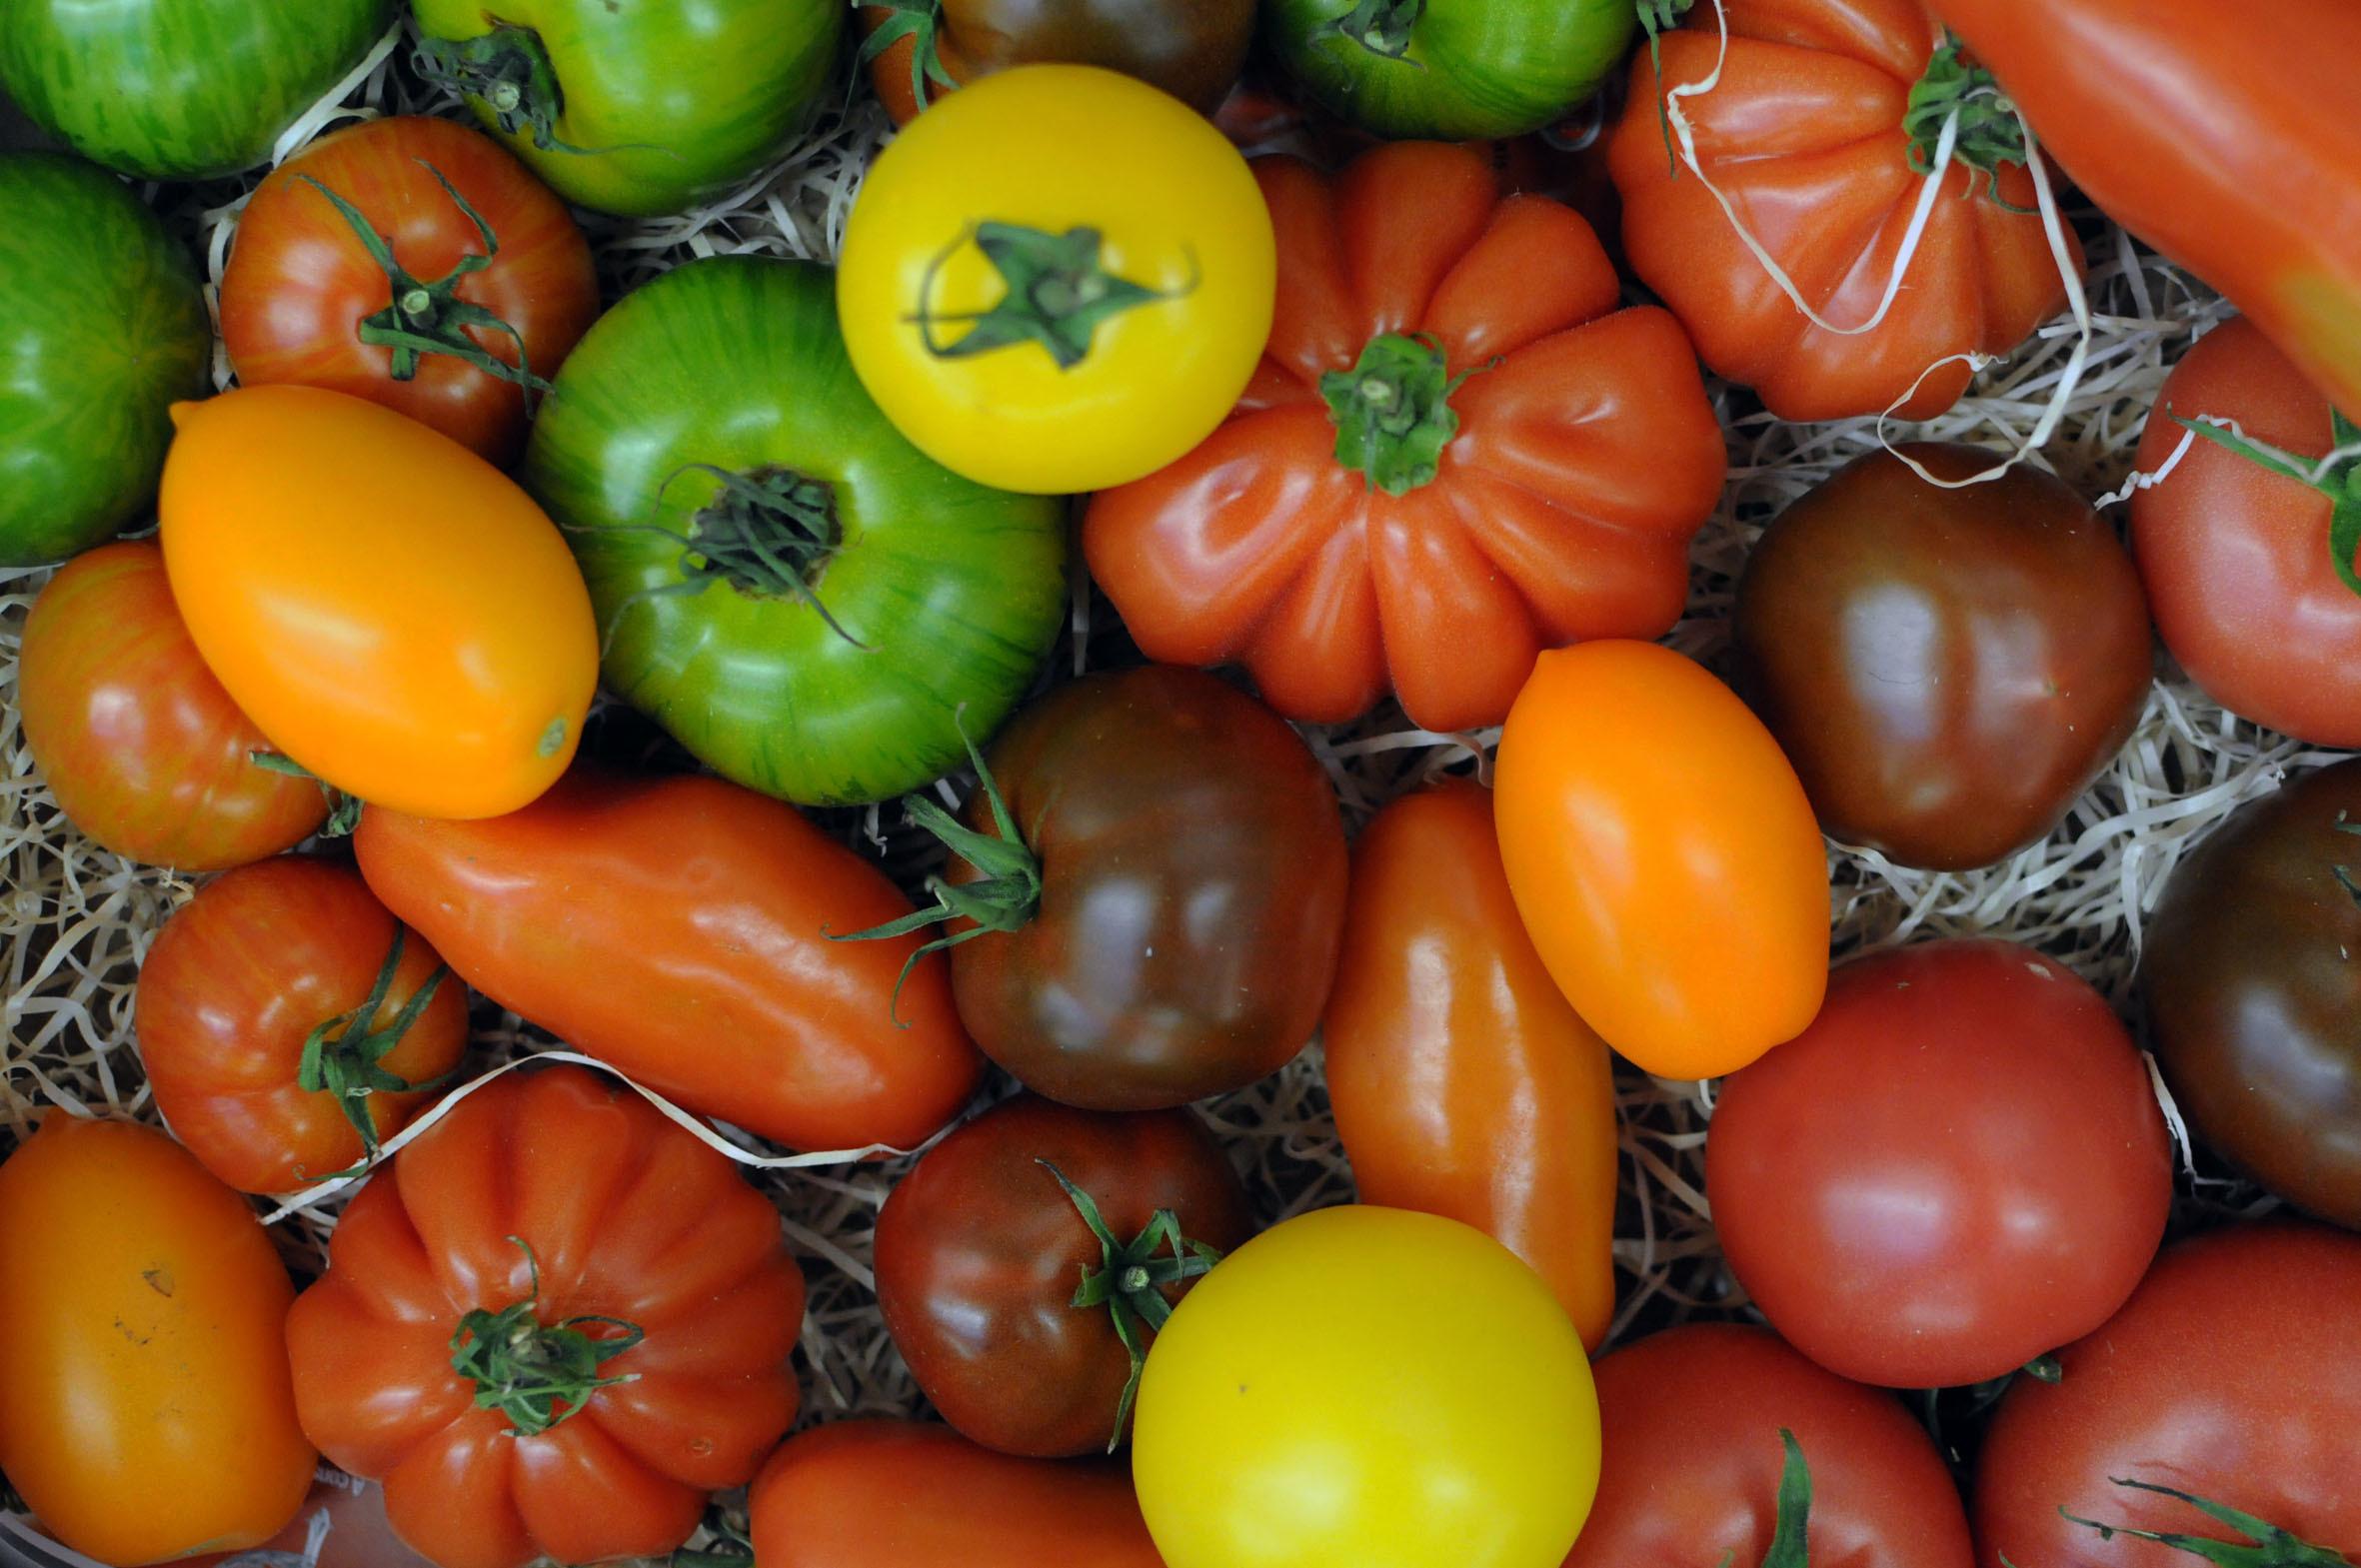 tomatoes_170922_135452.jpg?mtime=20170922135452#asset:11468